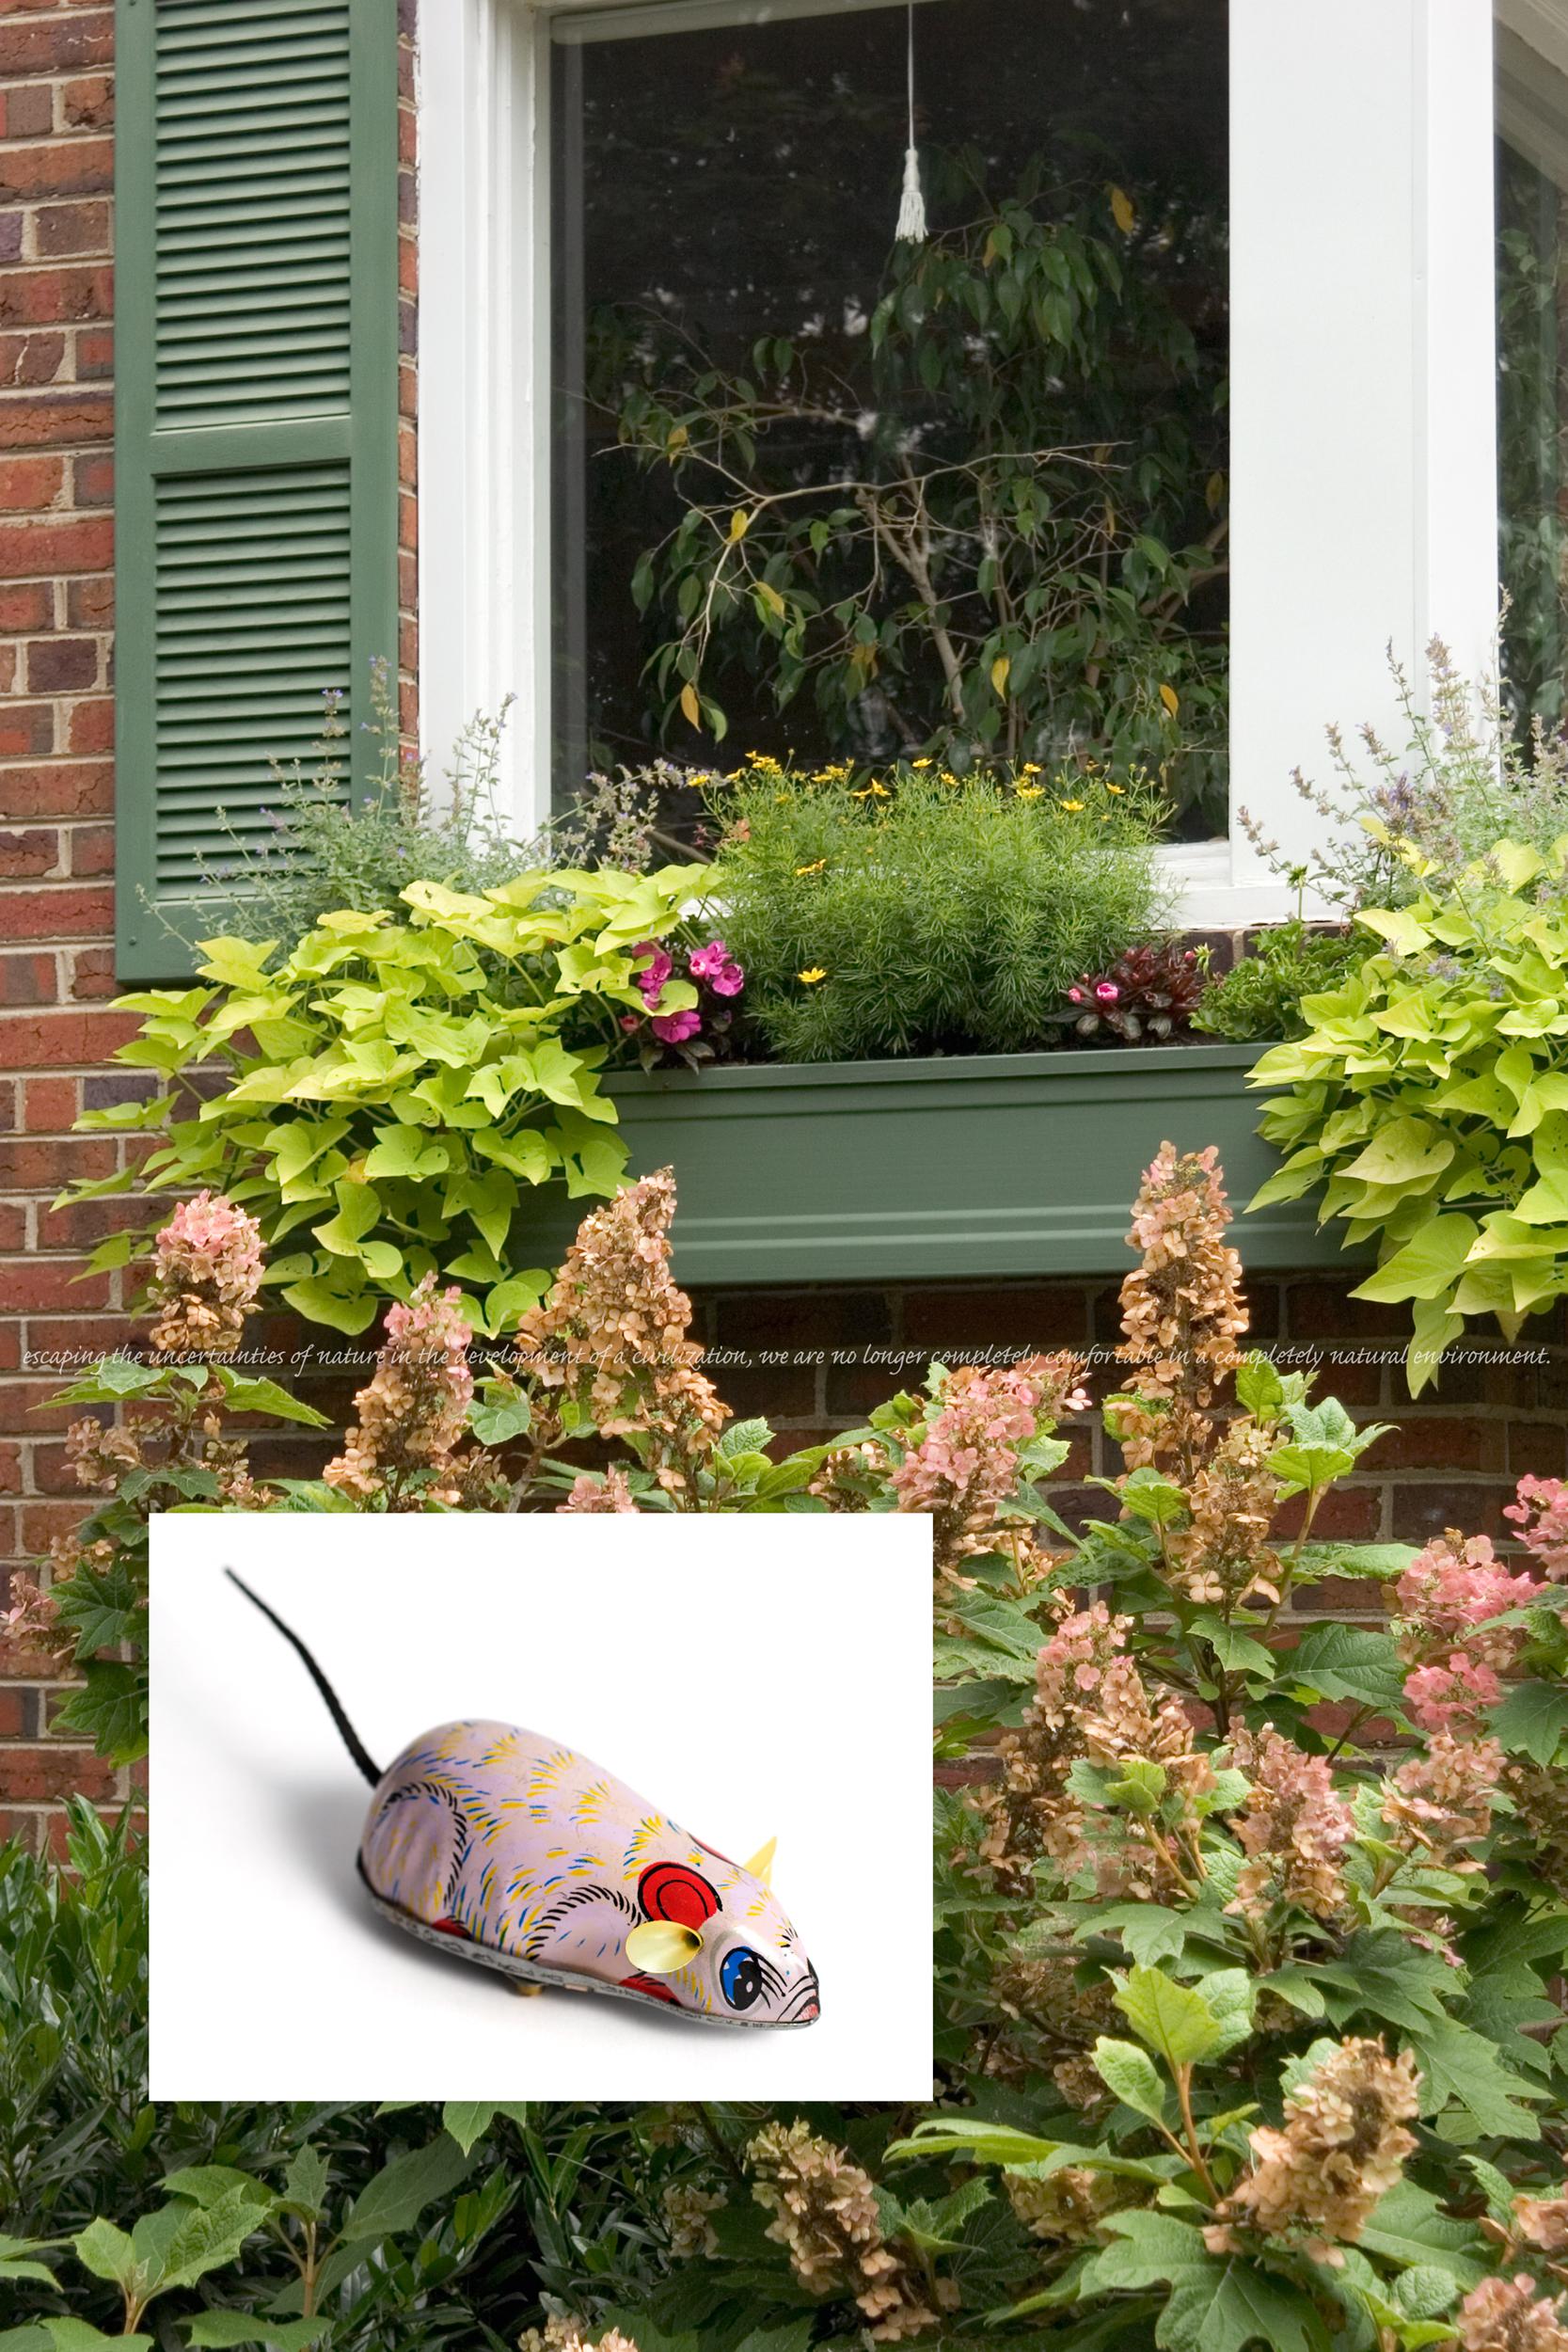 Flora & Fauna: Mouse